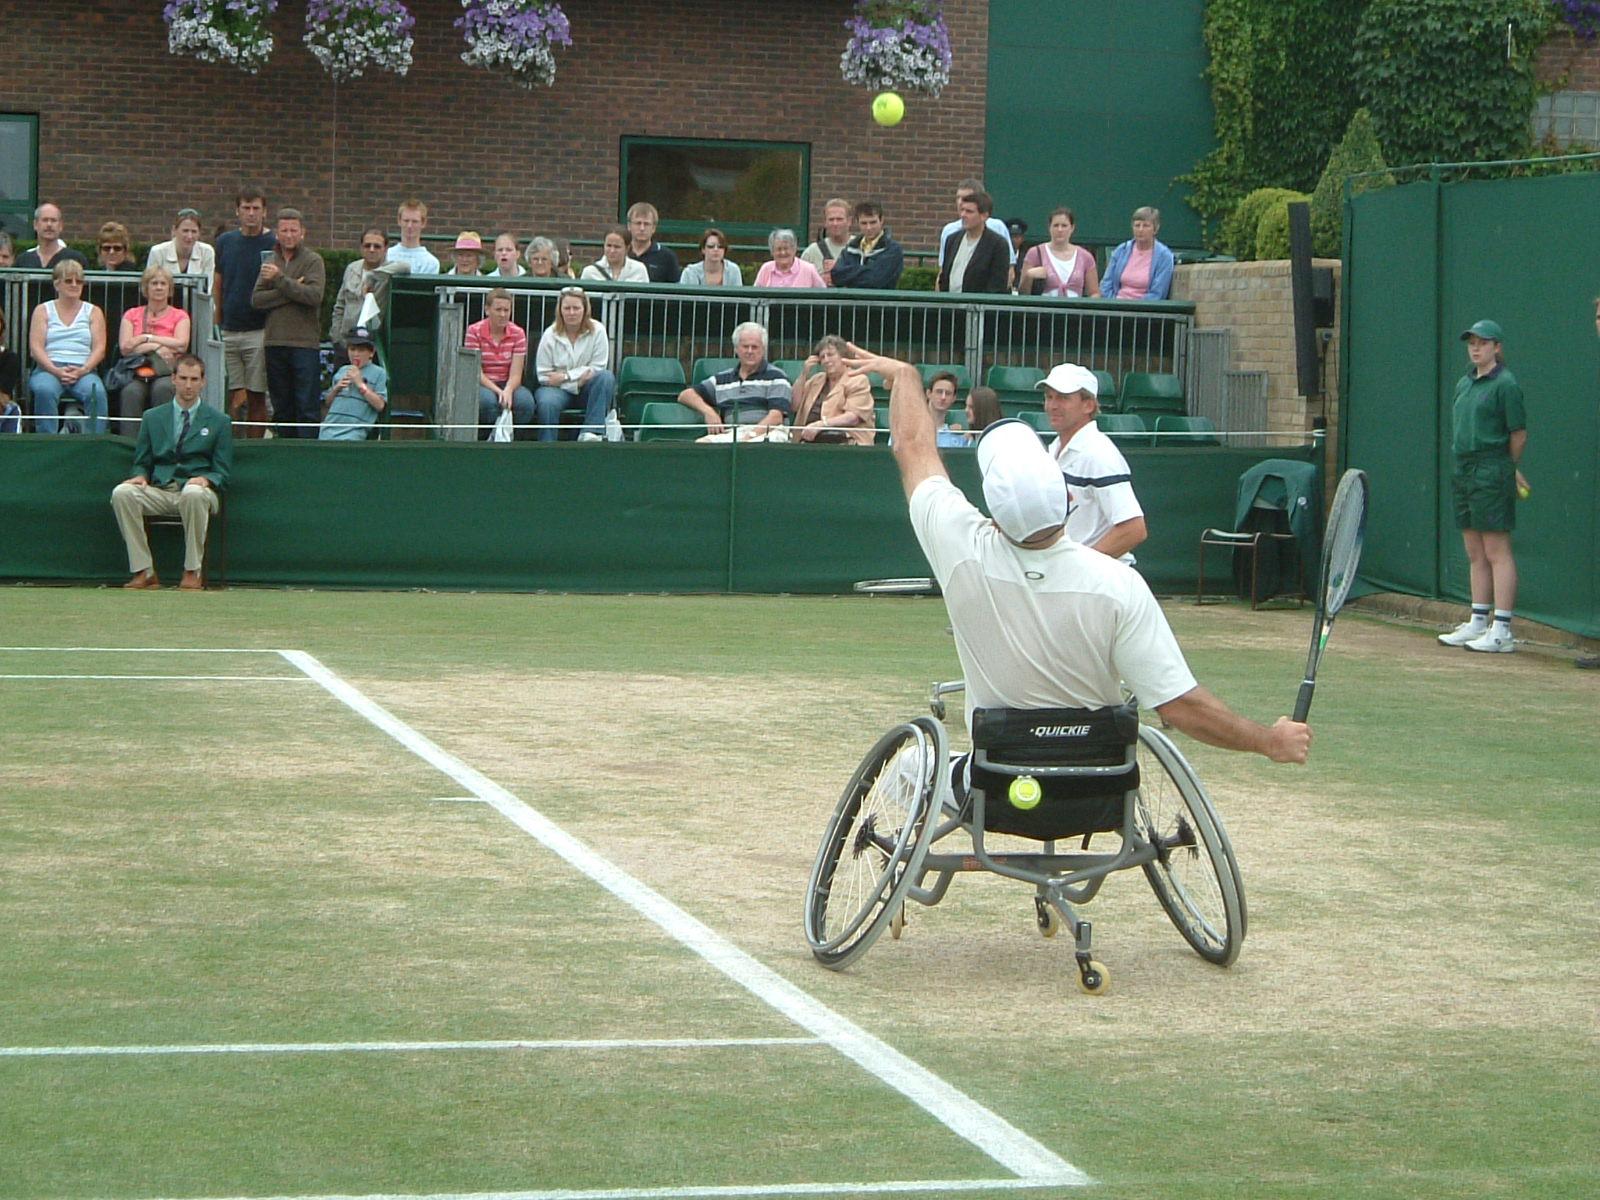 wheelchair jump soft cushion for office chair file wimbledon 2005 jpg wikimedia commons